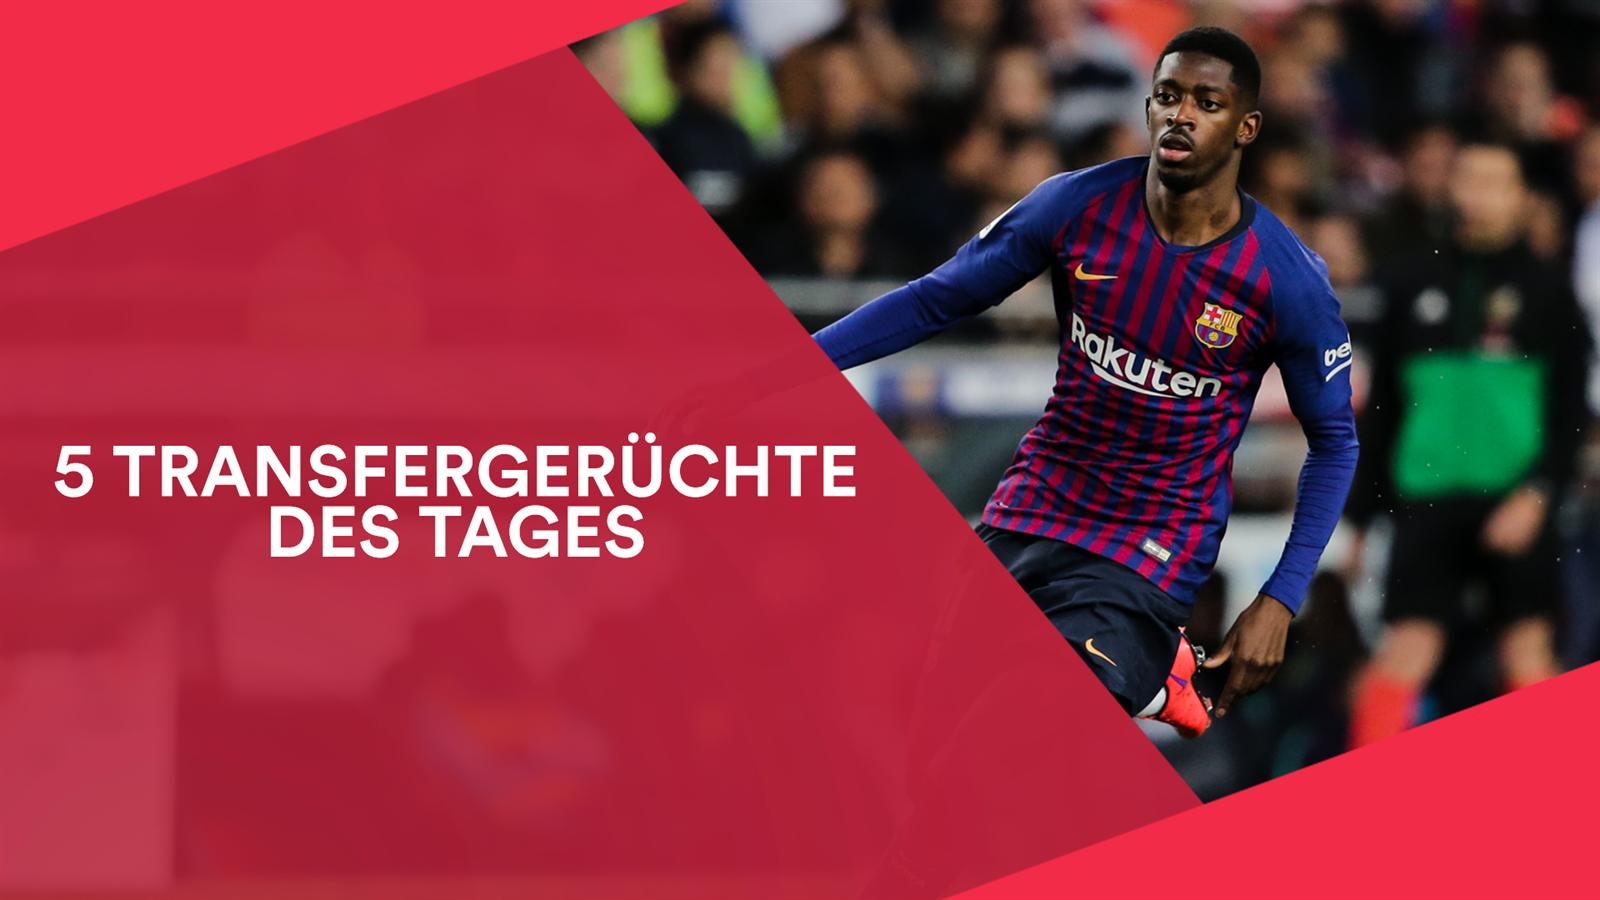 Transfergerüchte Fc Barcelona